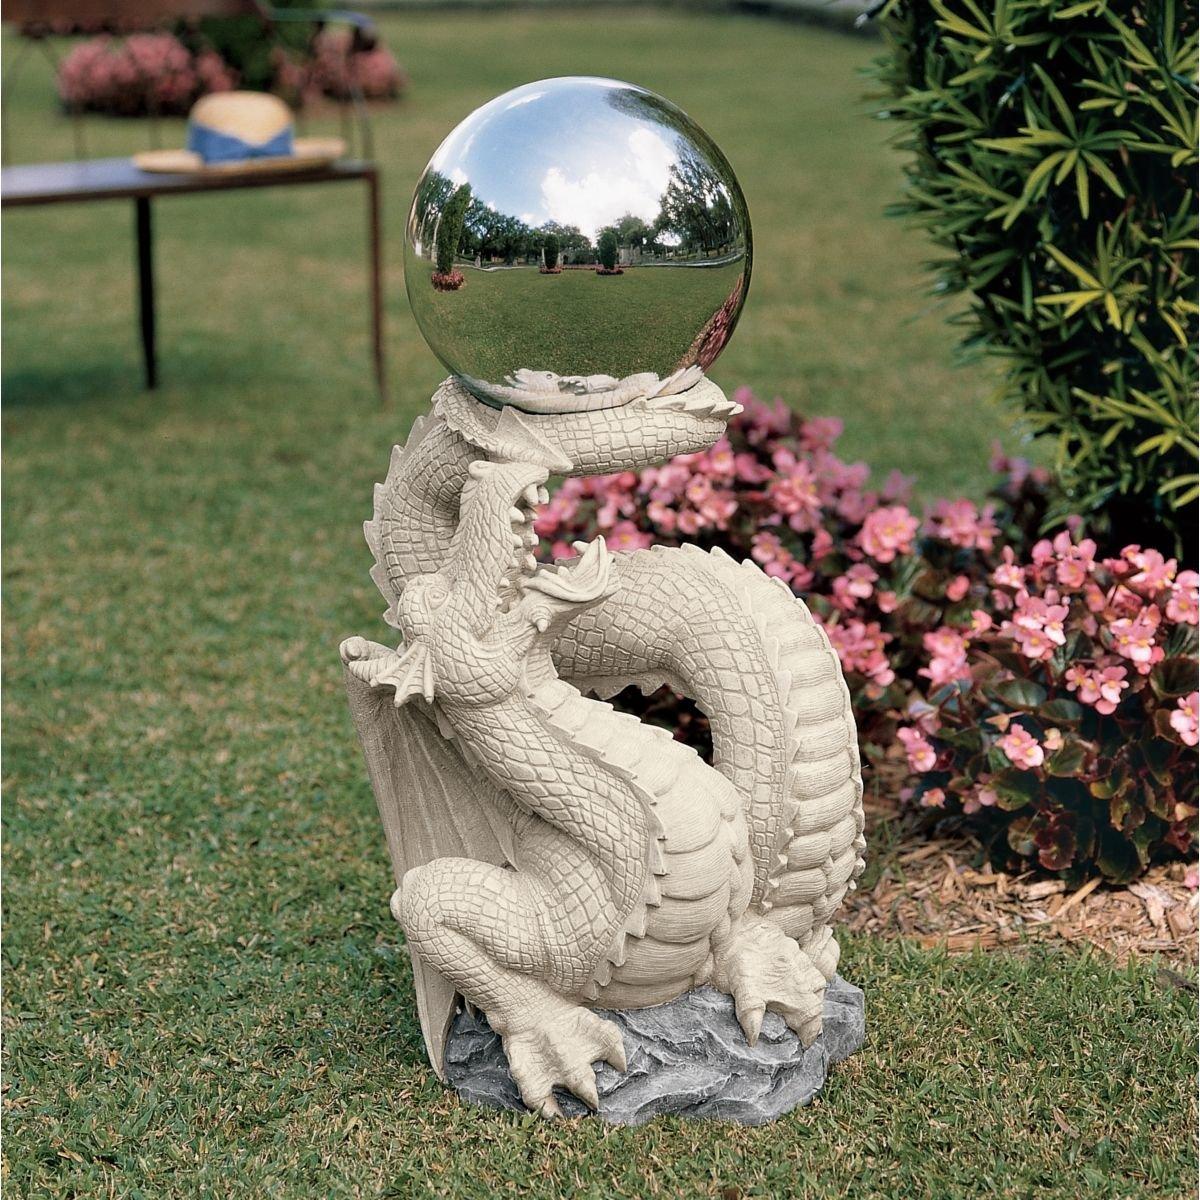 Outdoor decor statues - 30 Classic Dragon Gargoyle Home Garden Statue Sculpture Figurine With Shinin